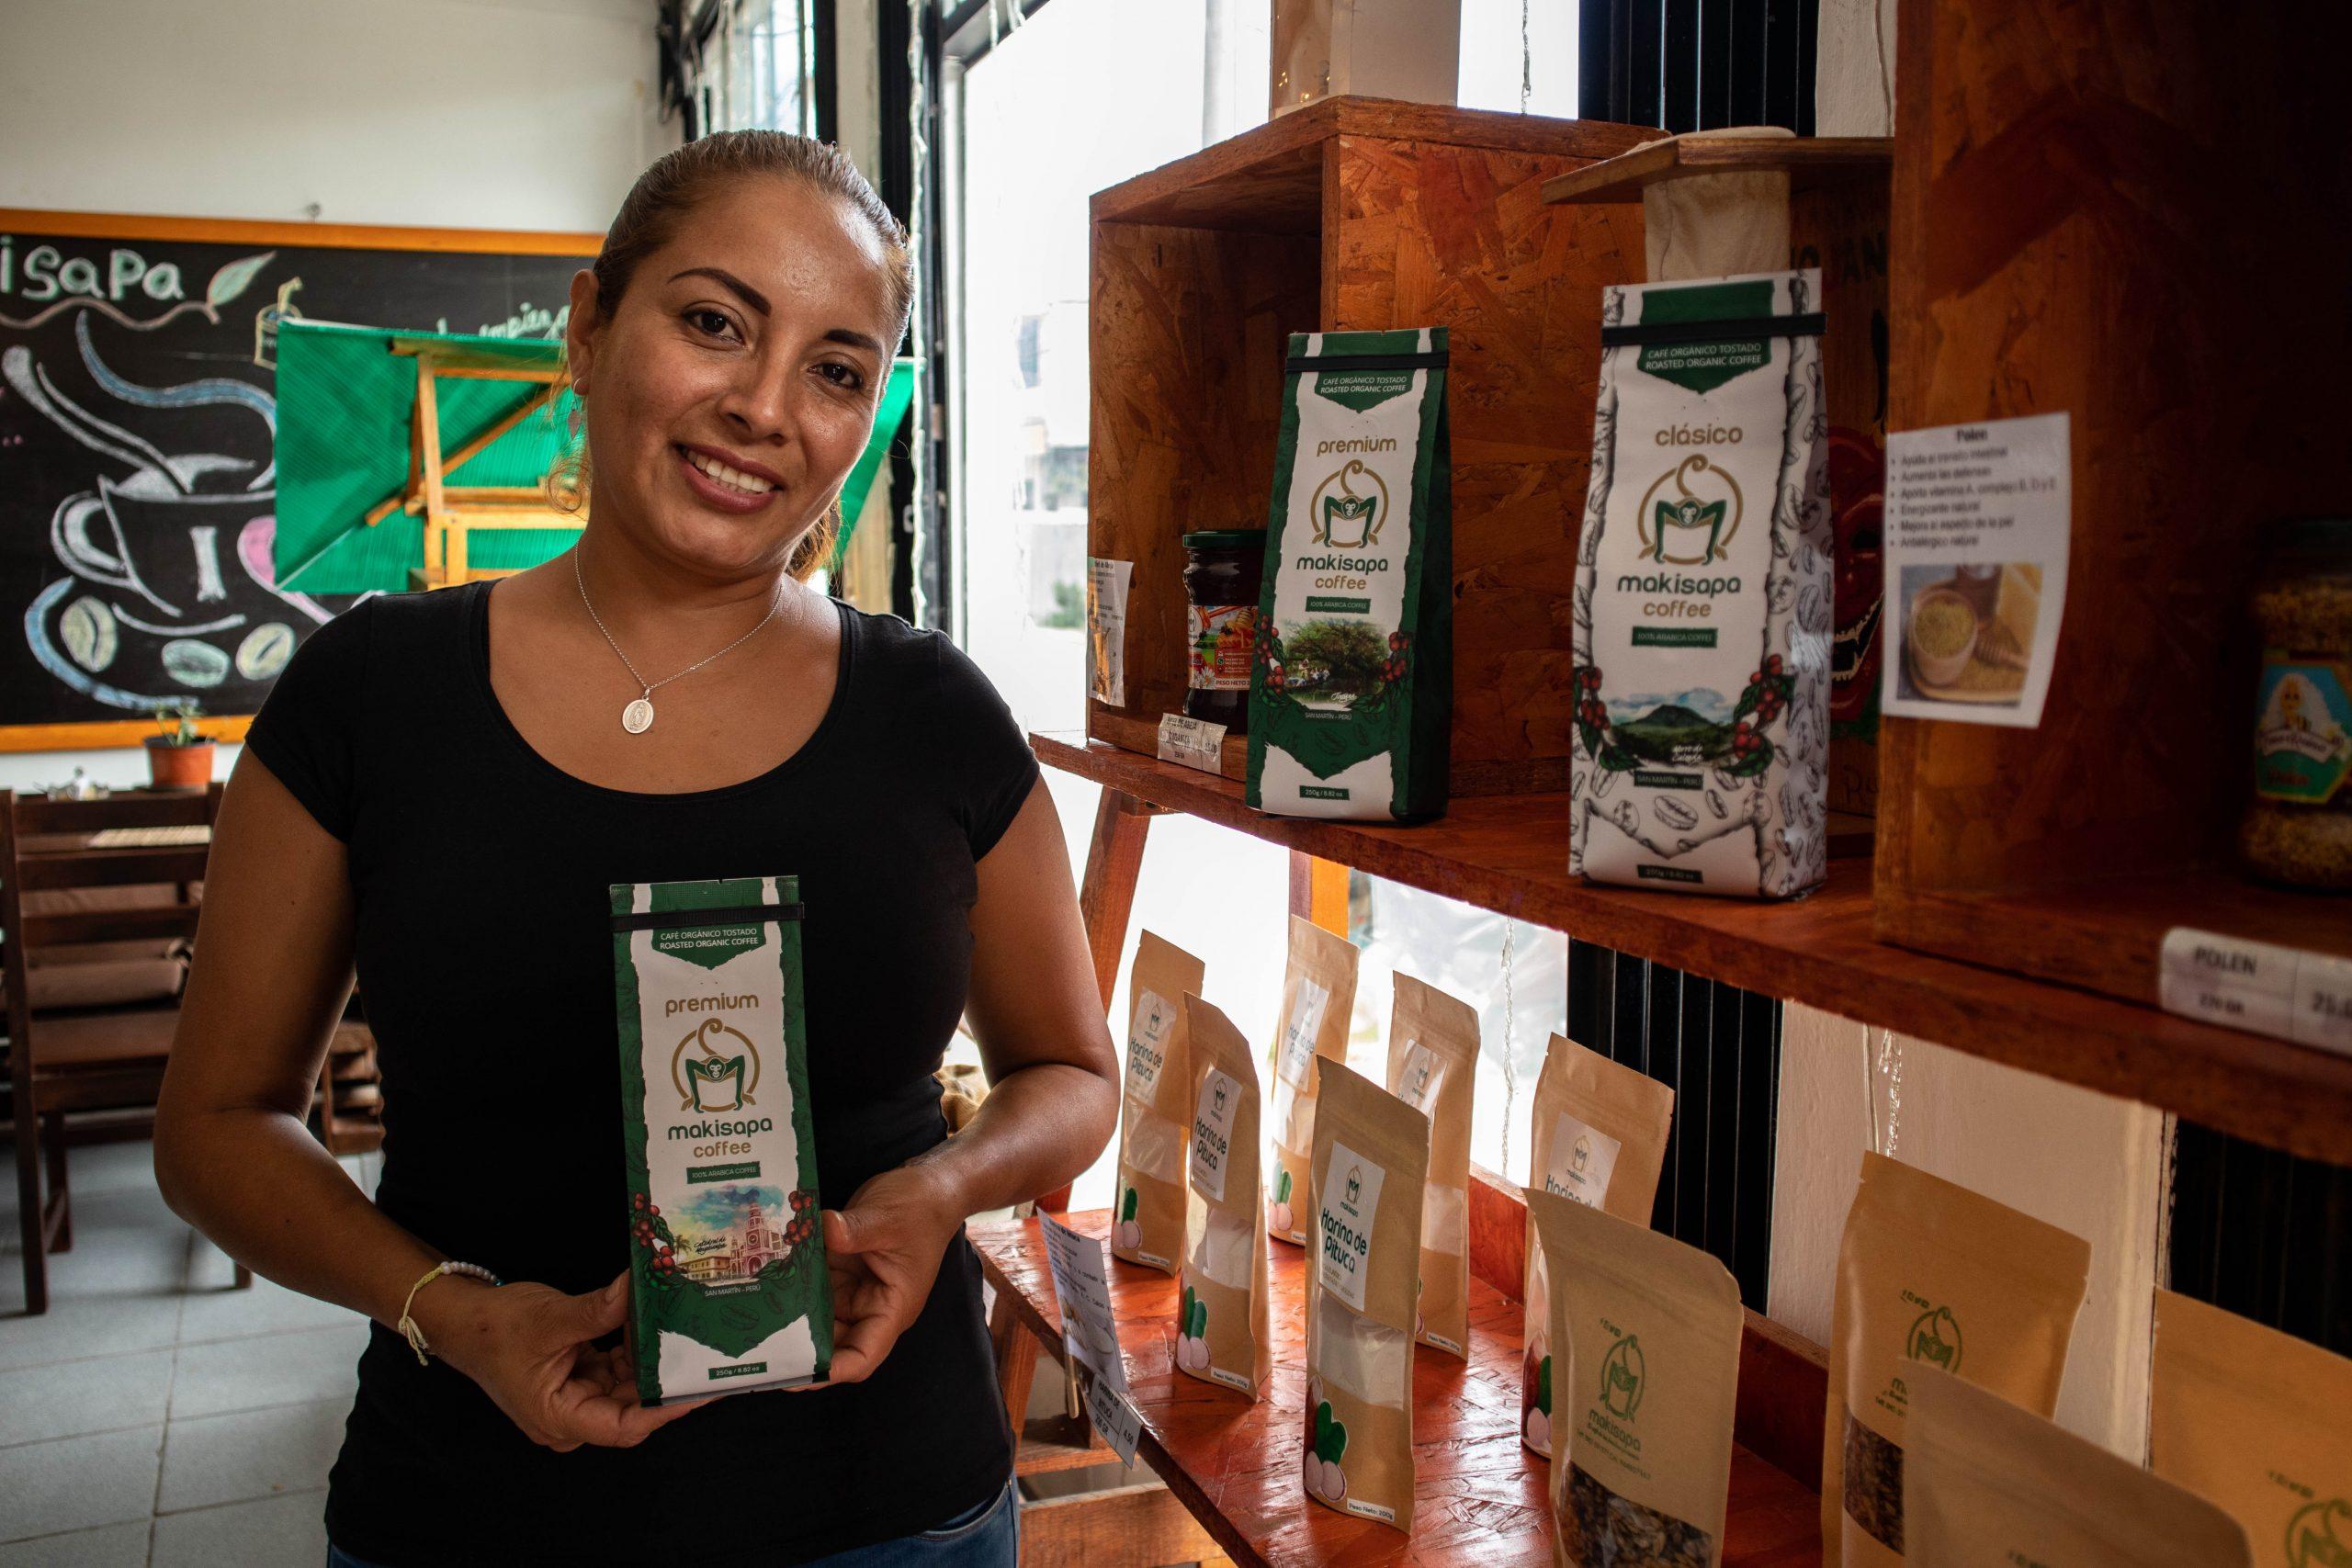 Juliana Solis Baron is an entrepreneur in Peru